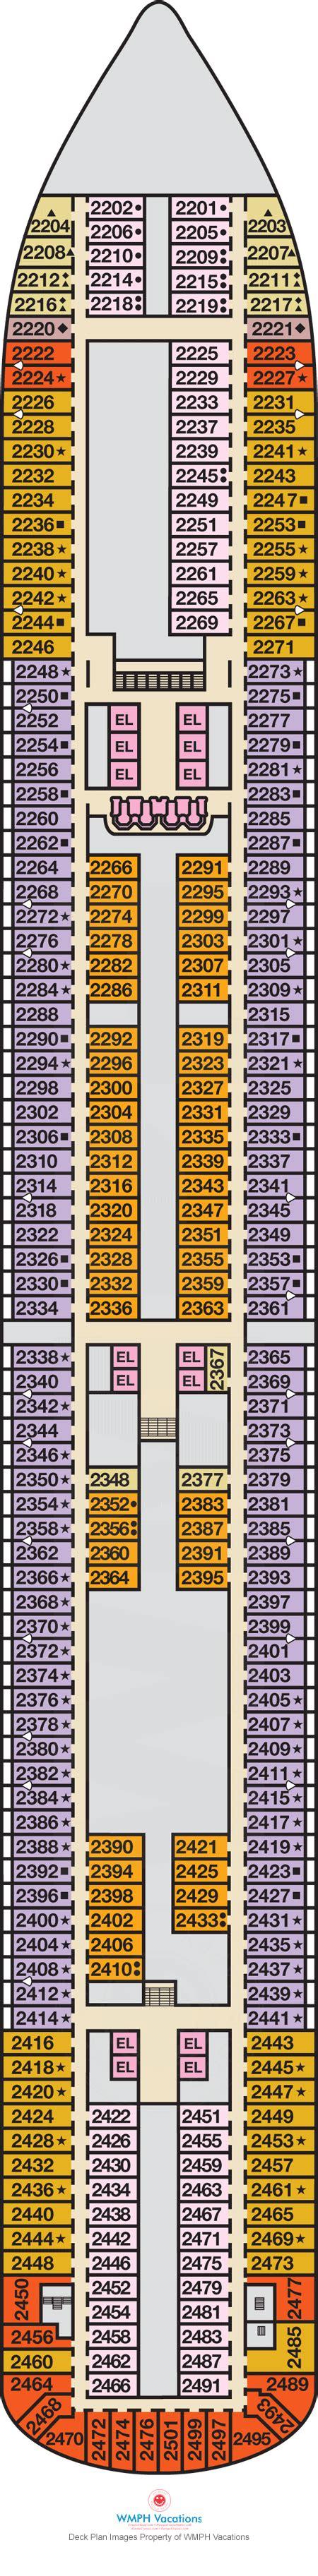 carnival breeze floor plan carnival breeze deck plans deck 2 what s on deck 2 on carnival breeze cruisecheap com